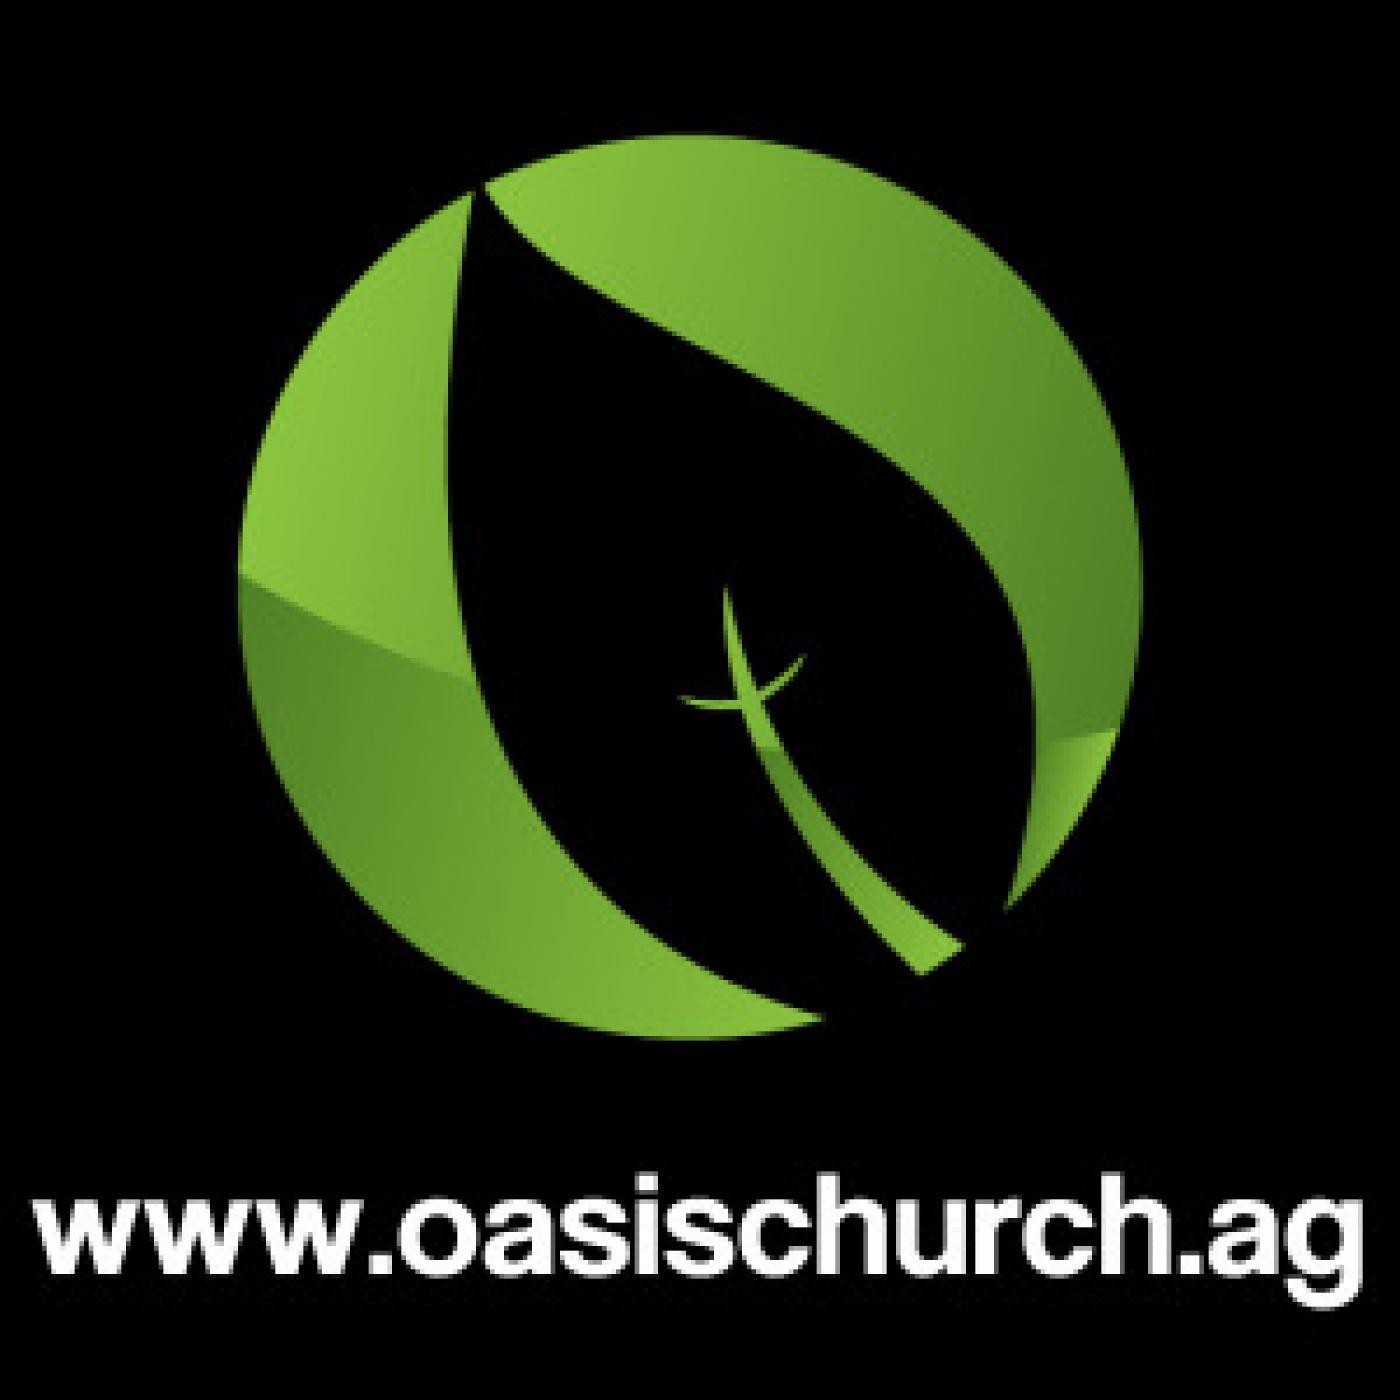 Oasis Church (Bradenton/Sarasota Fl)